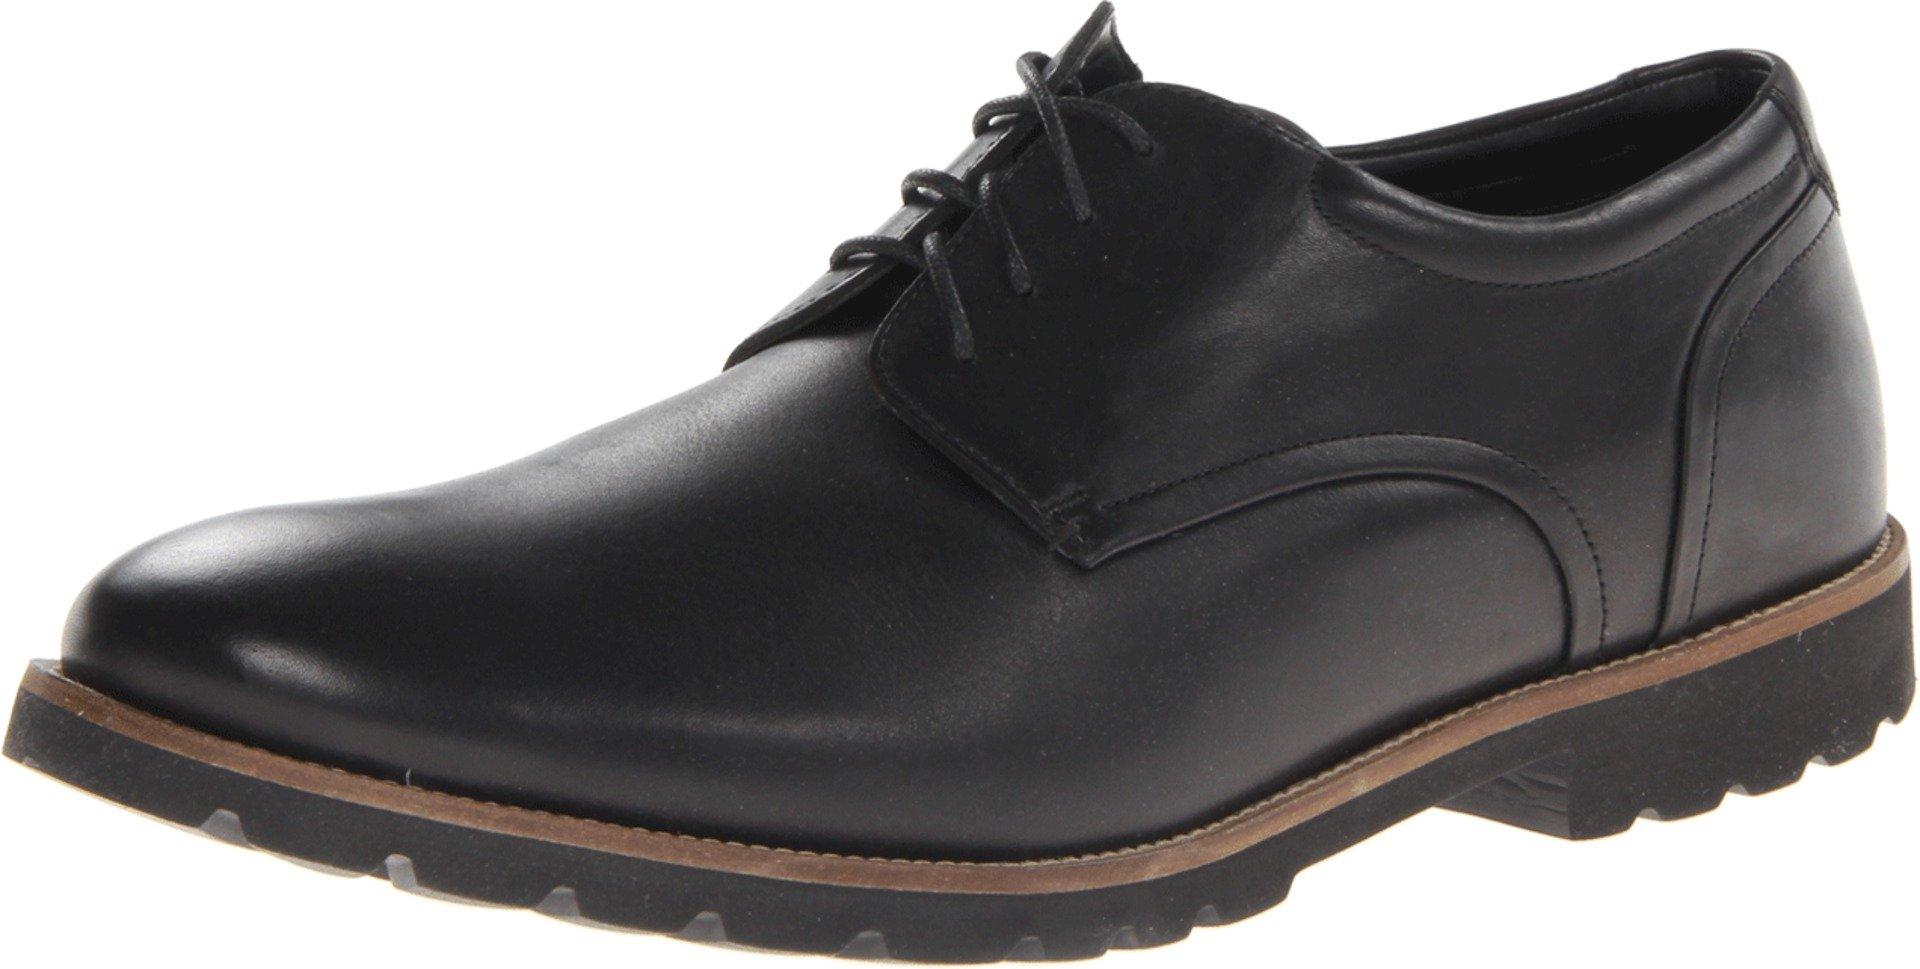 Rockport Men's Colben Plain Toe Oxford- Black-7.5 W